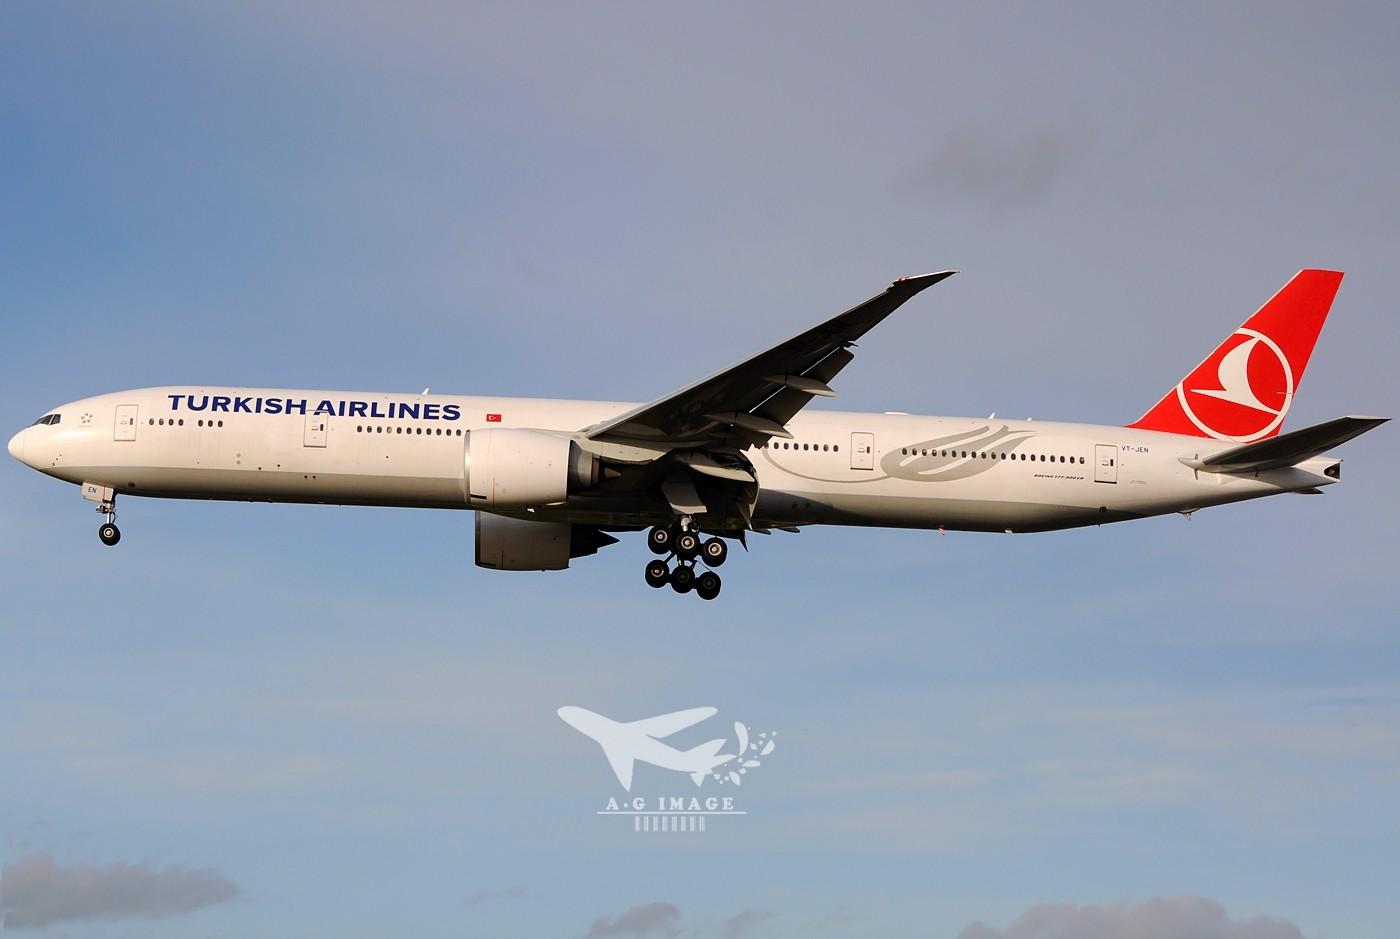 Re:[原创]【七彩天空】--八张来自LHR的77w大图,看到血脉喷张! BOEING 777-300 VT-JEN 英国伦敦希思罗机场